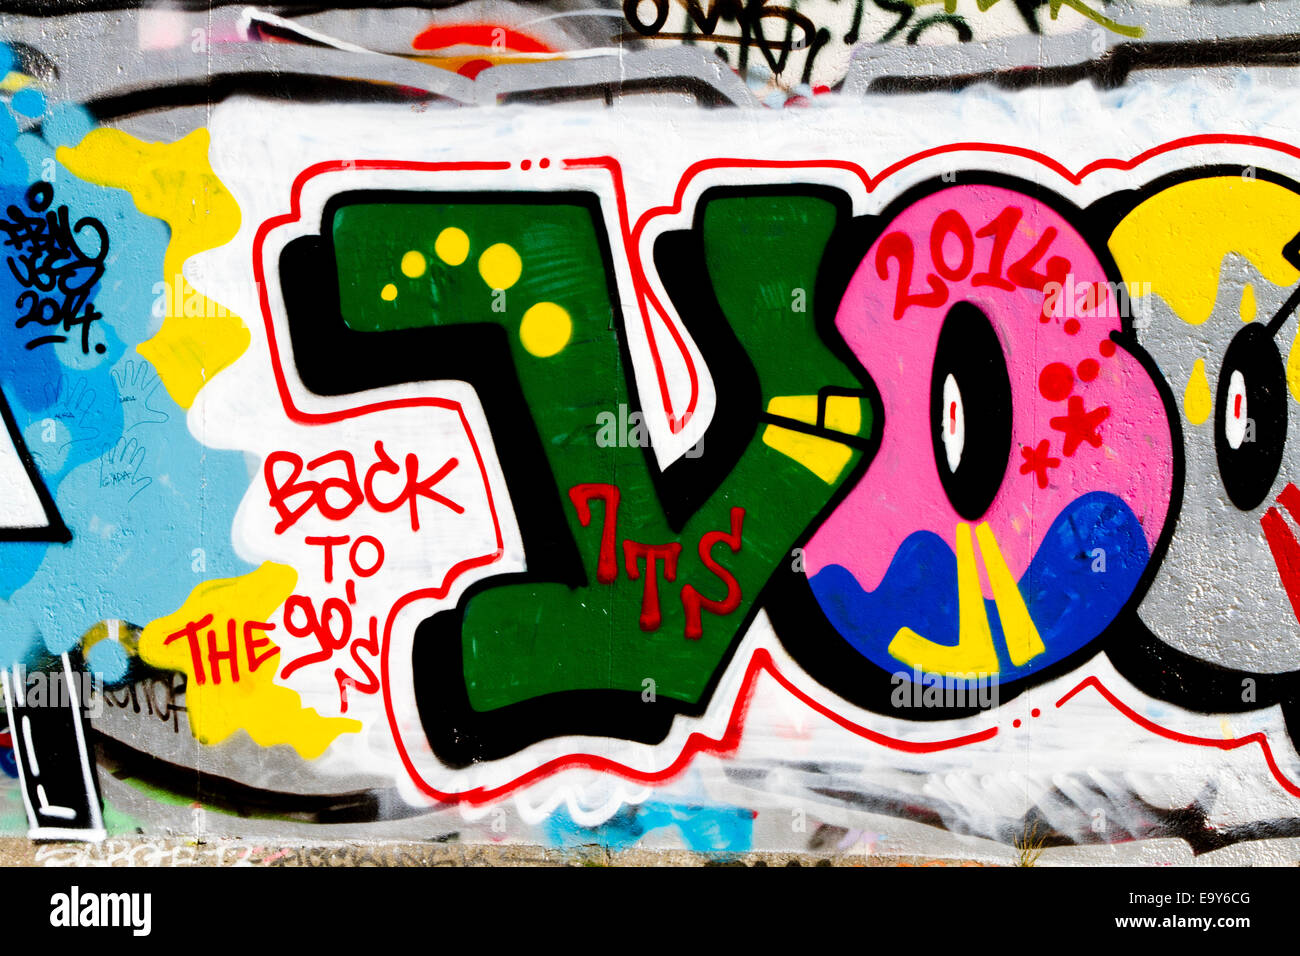 Grafiti wall berlin - Stock Photo Back To The 90s Berlin Wall Graffiti Urban Colour